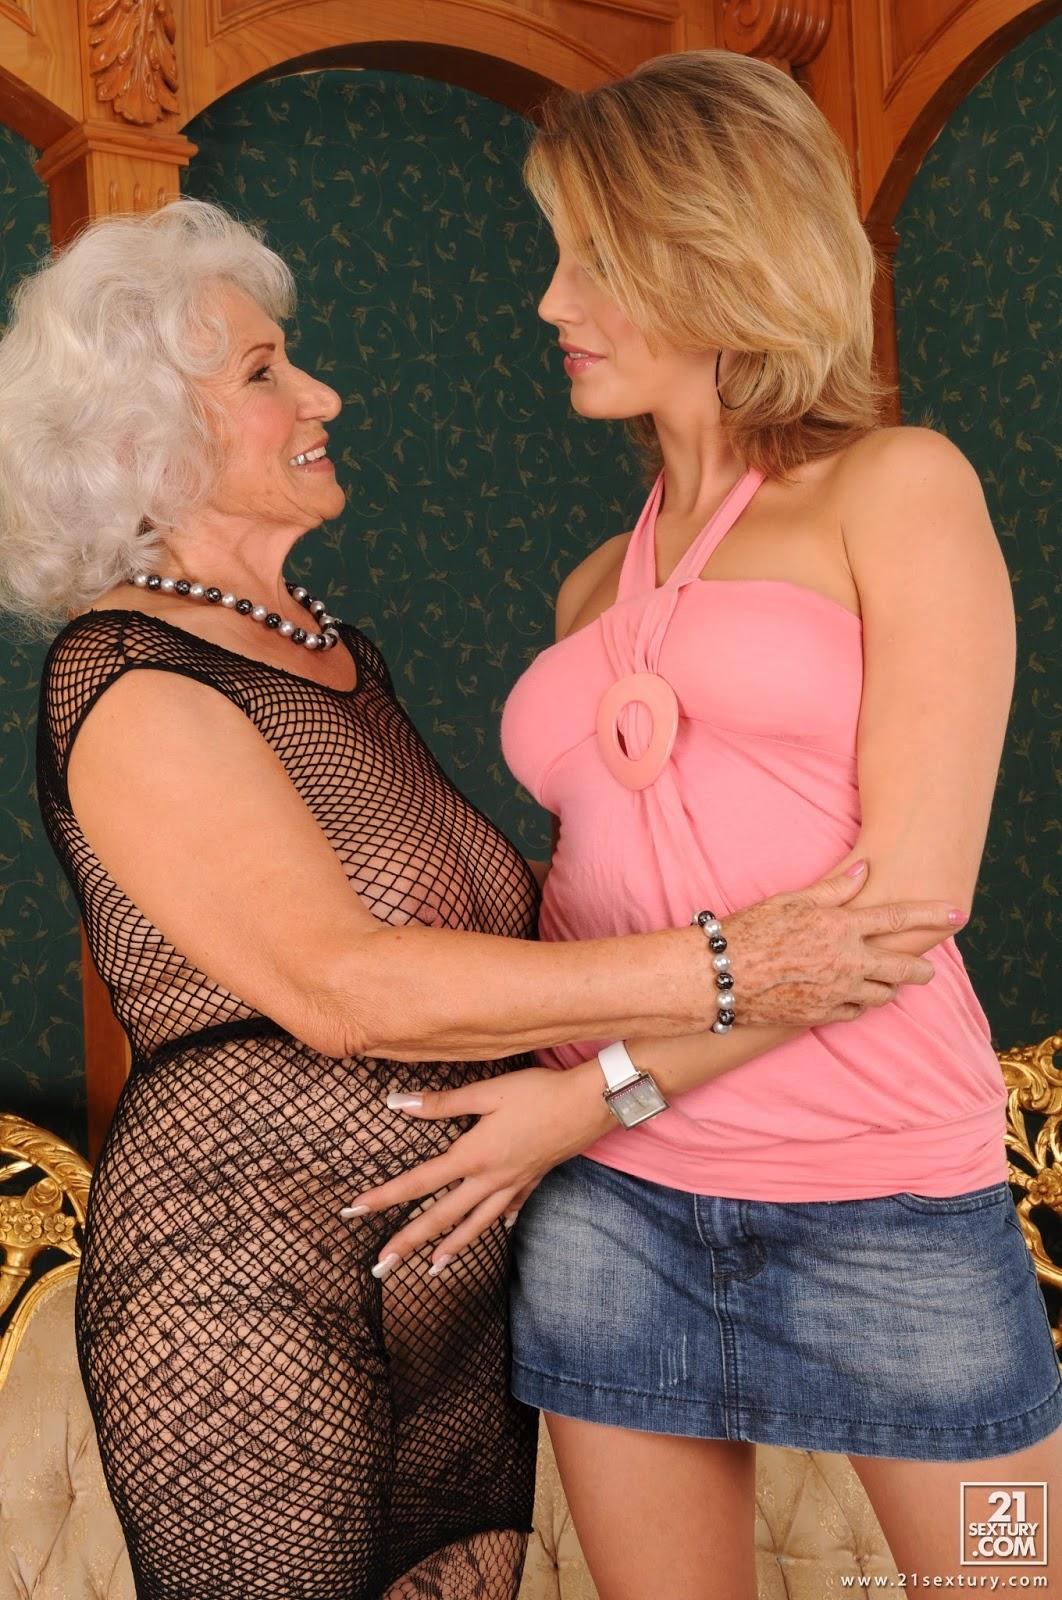 Abuela de 72 desnuda - 1 part 1